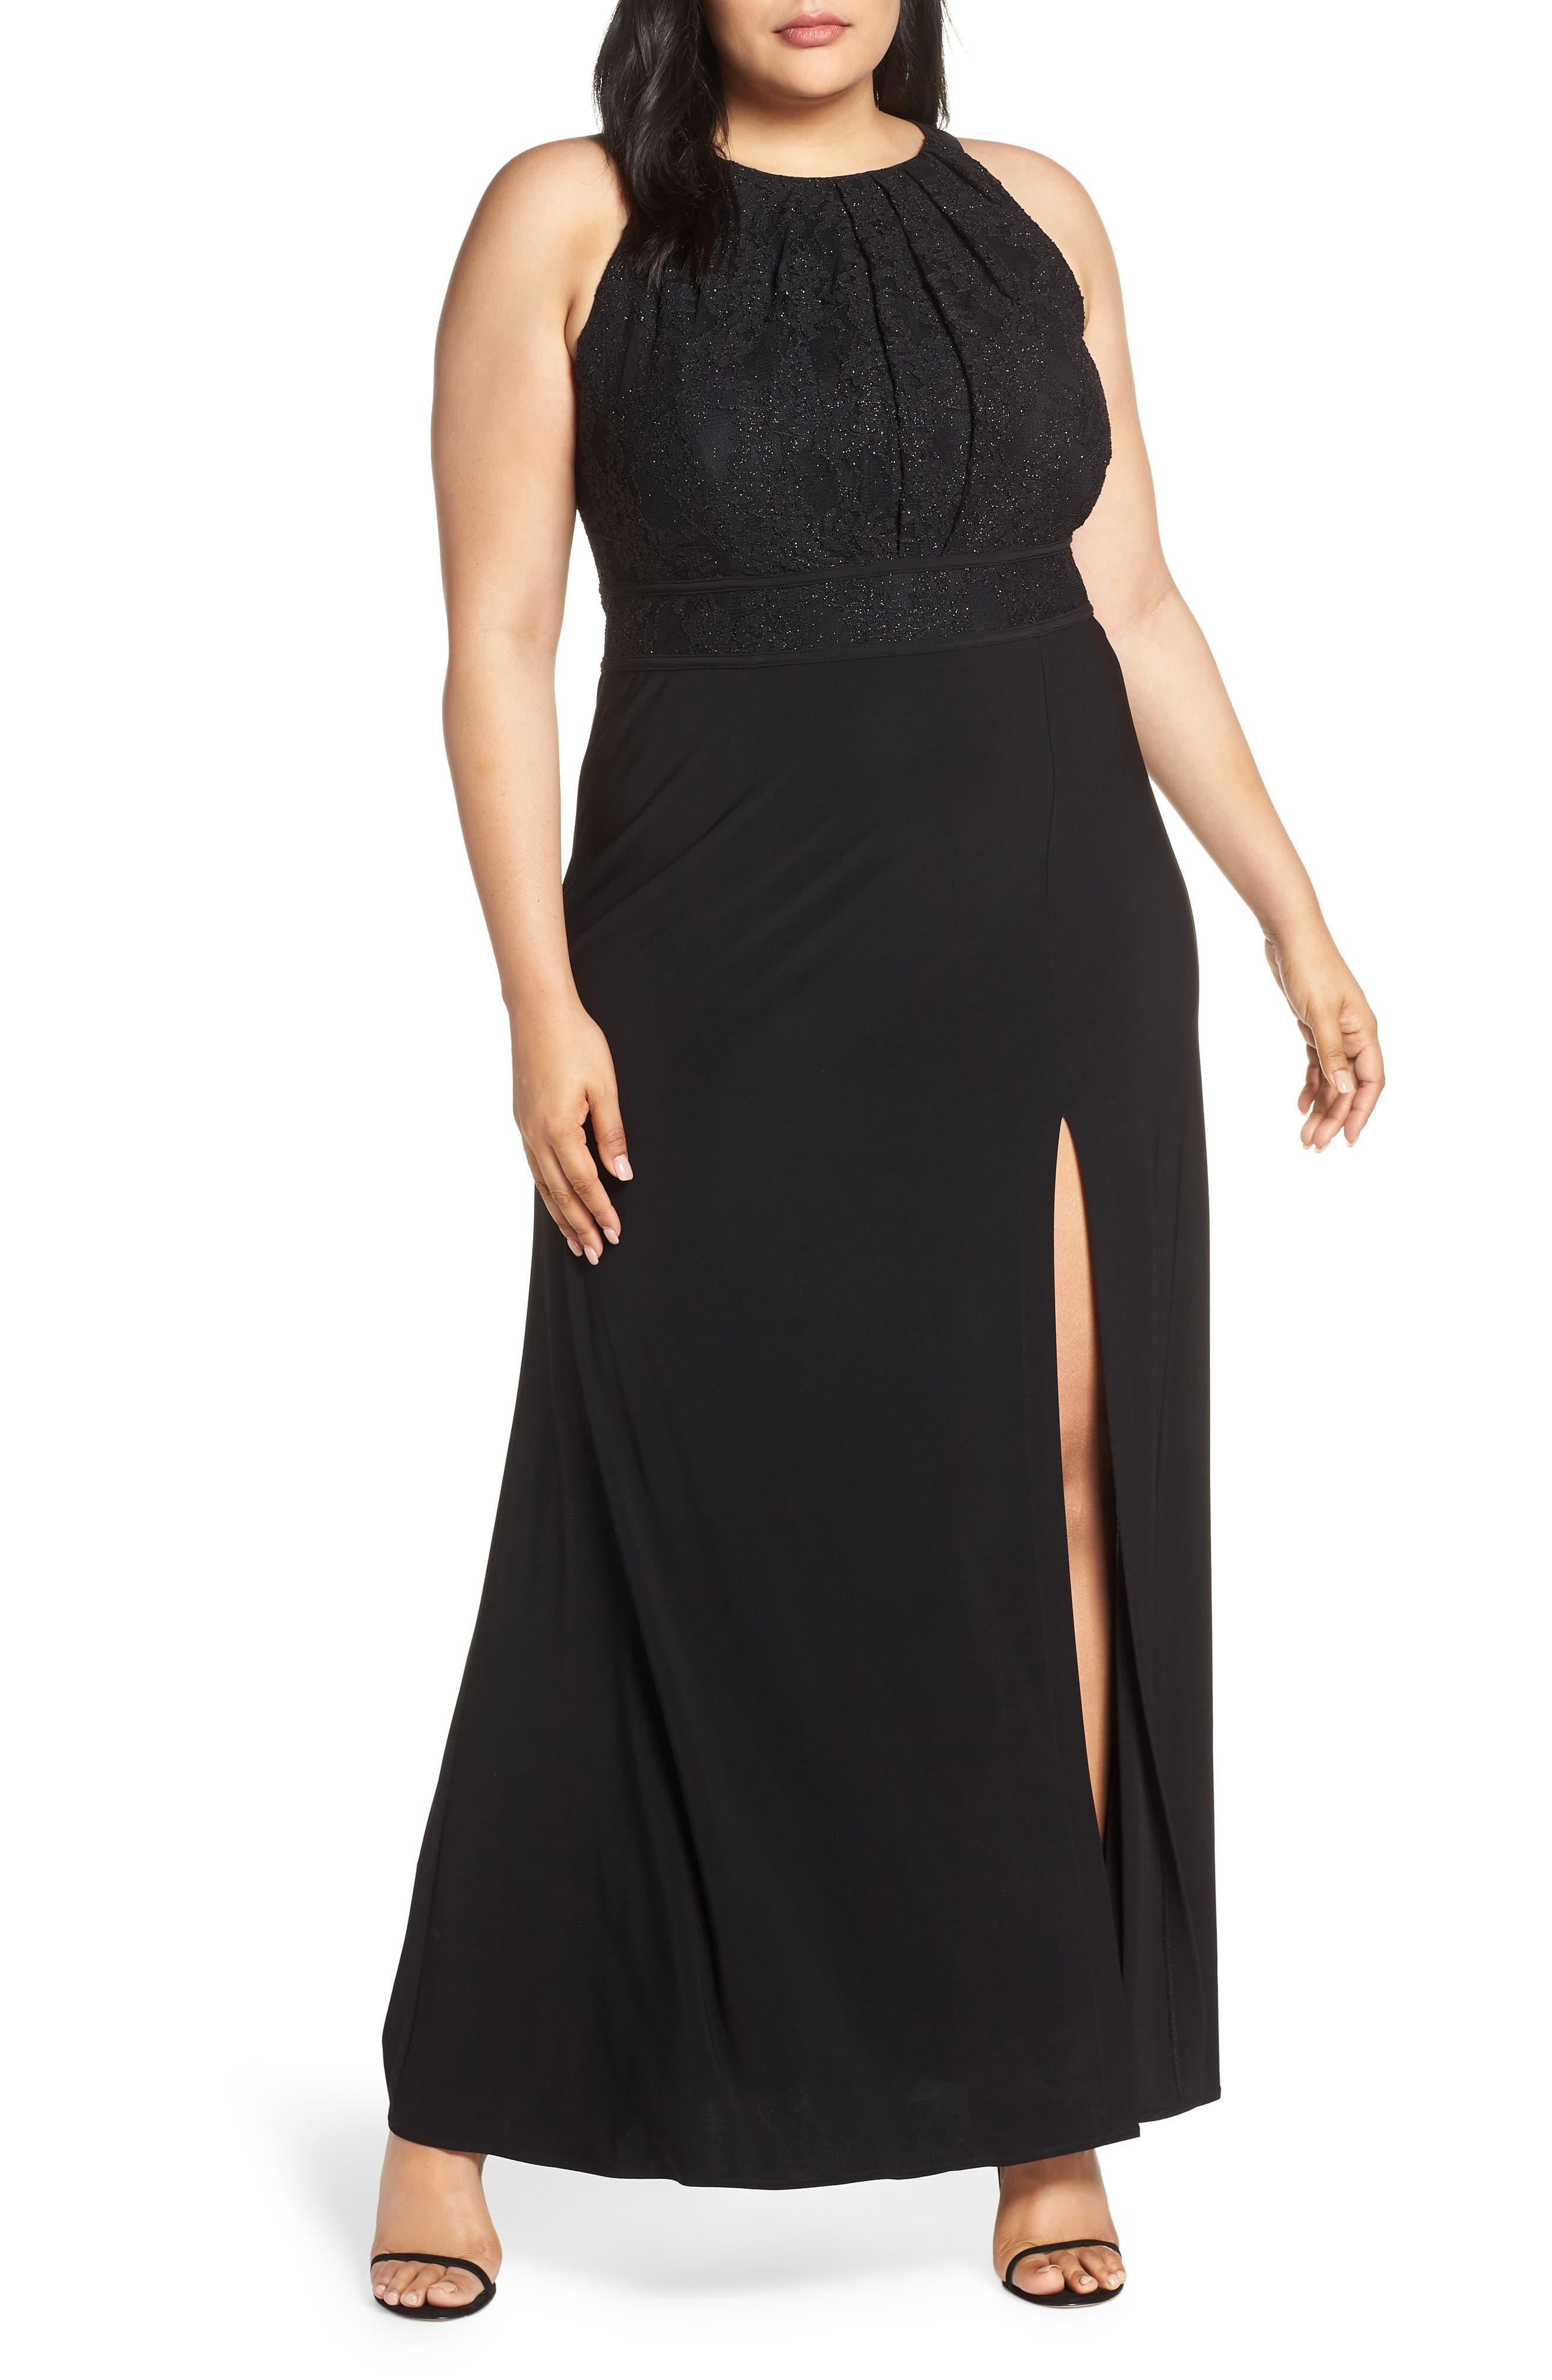 Plus Size Morgan & Co. Pleat Lace Bodice Evening Dress, Black